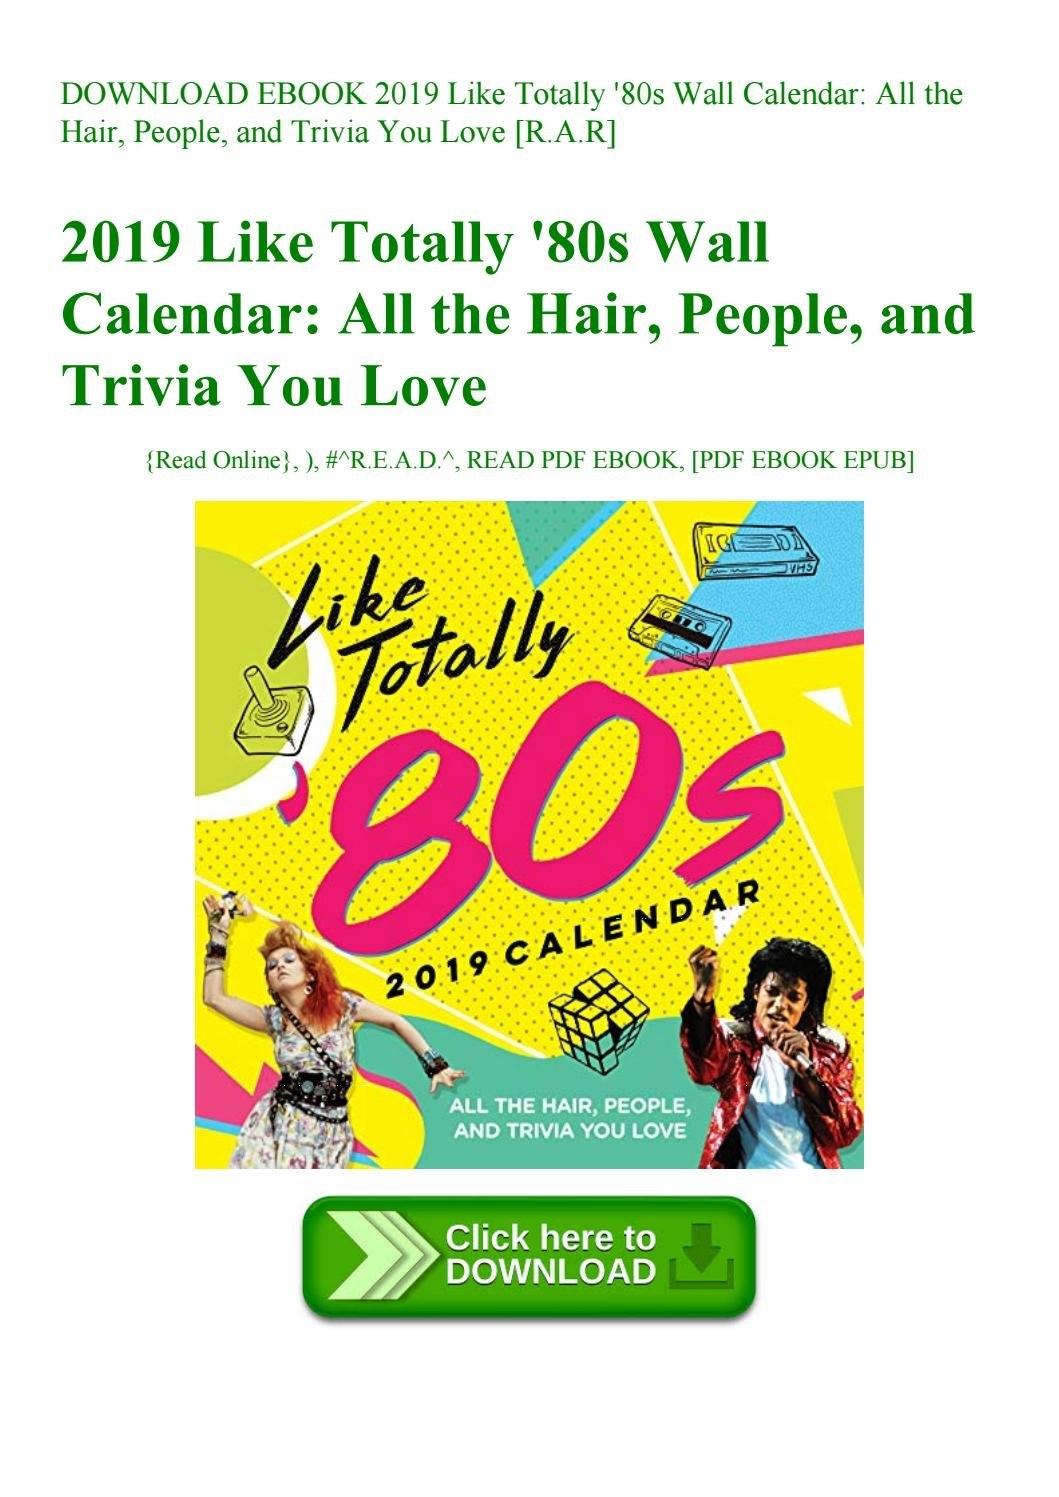 Download Ebook 2019 Like Totally '80S Wall Calendar All The Hair 2019 Calendar 80S